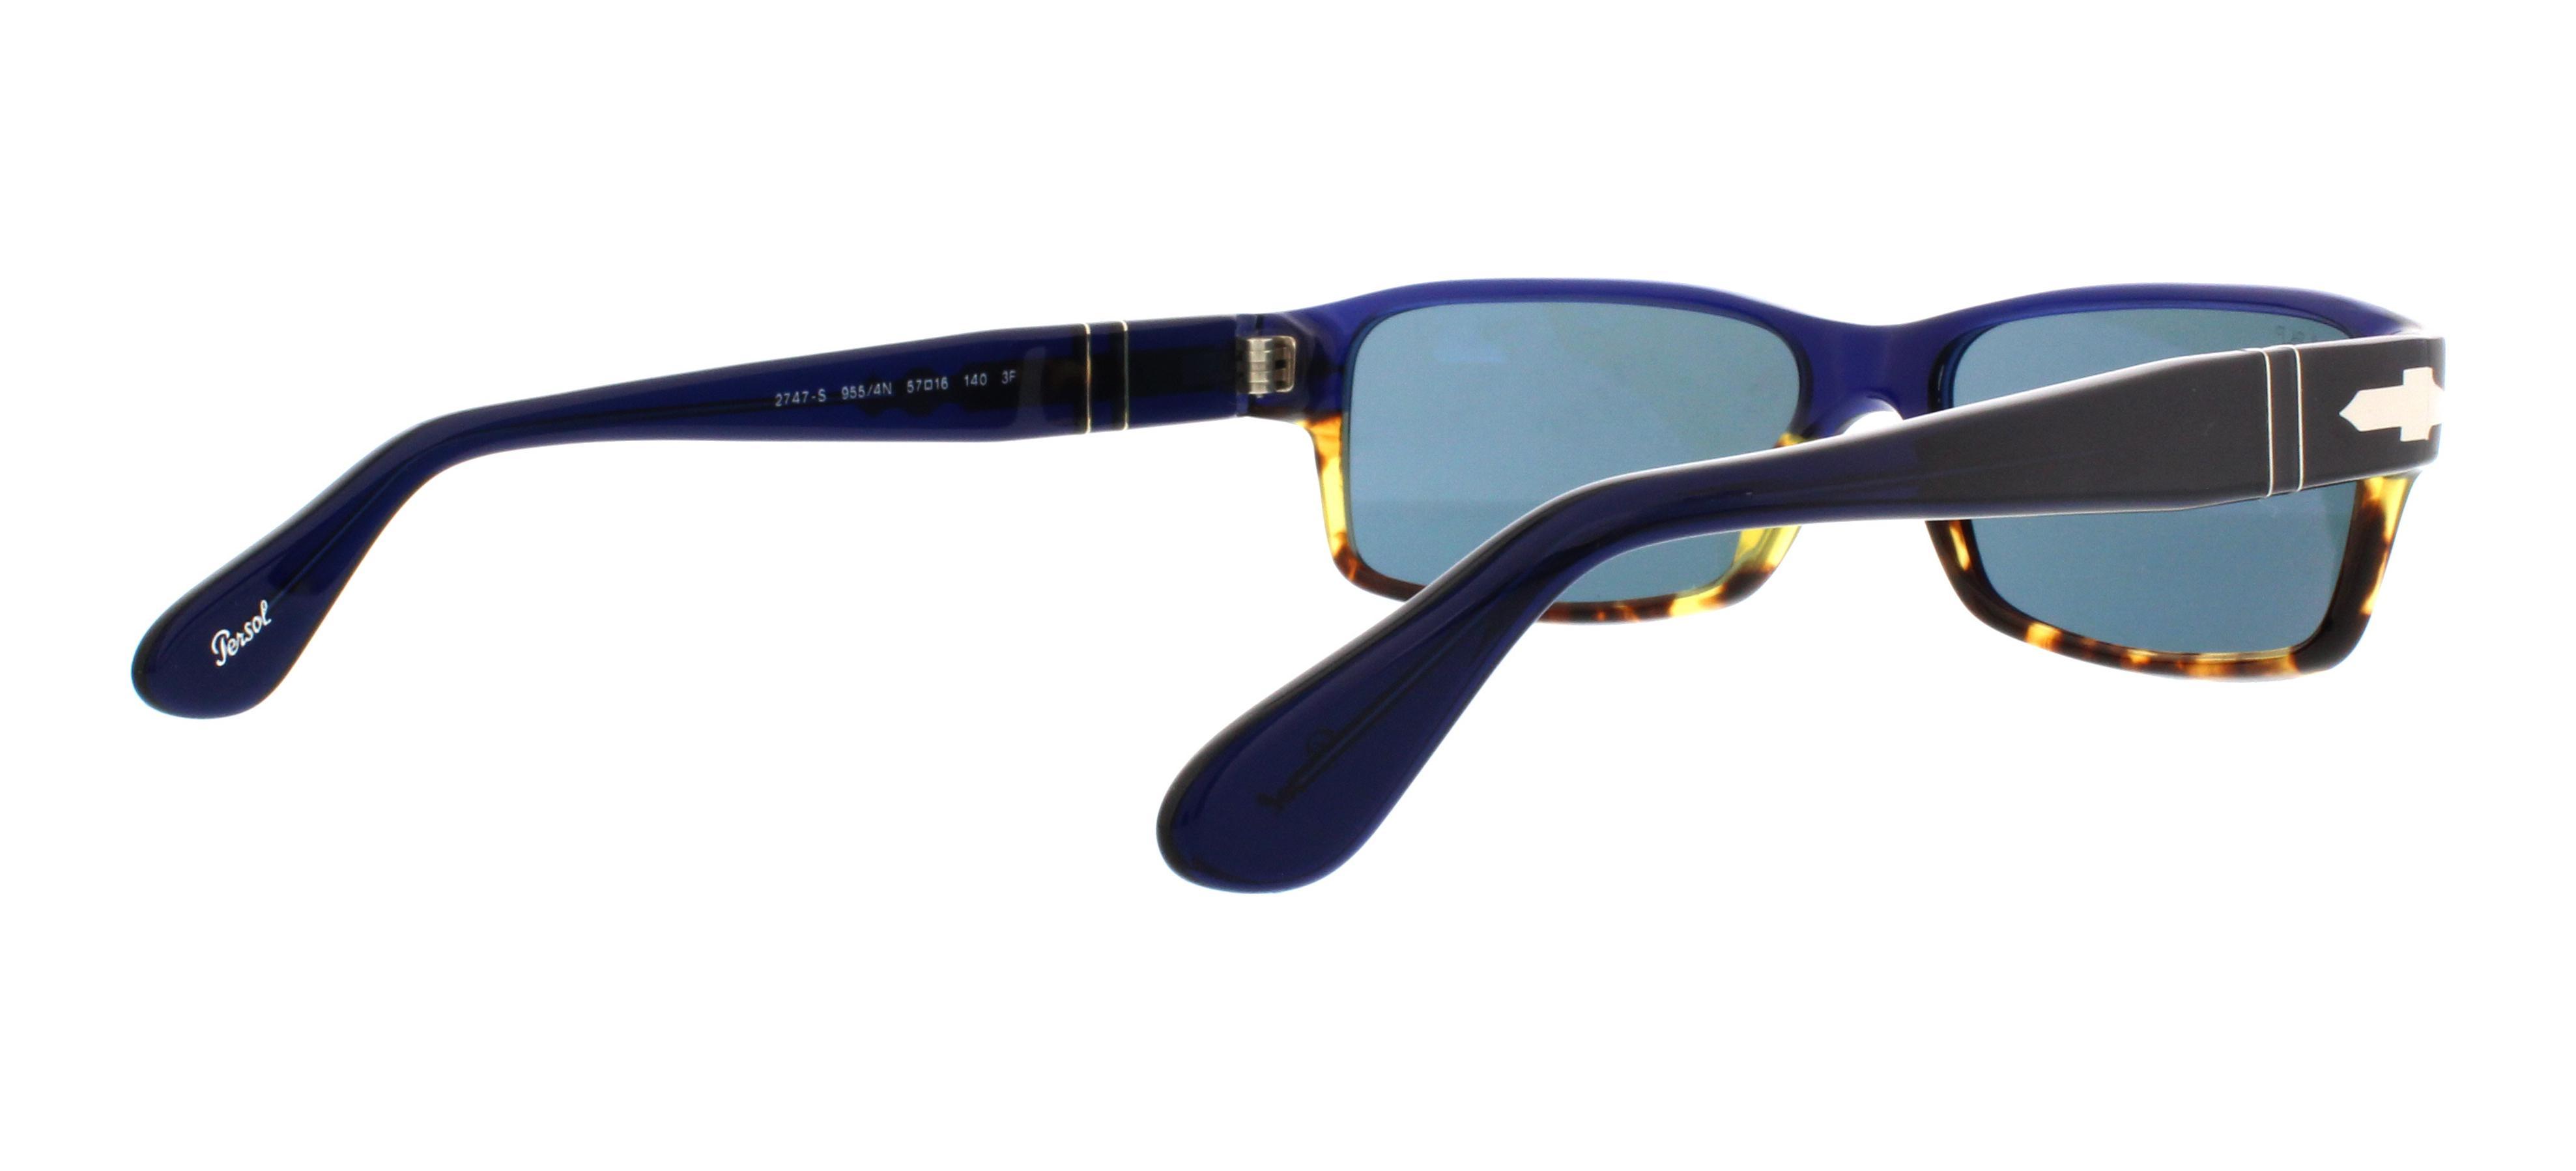 a5f6efb8585 PERSOL Sunglasses PO2747S 955 4N Havana Blue 57MM 200124469336